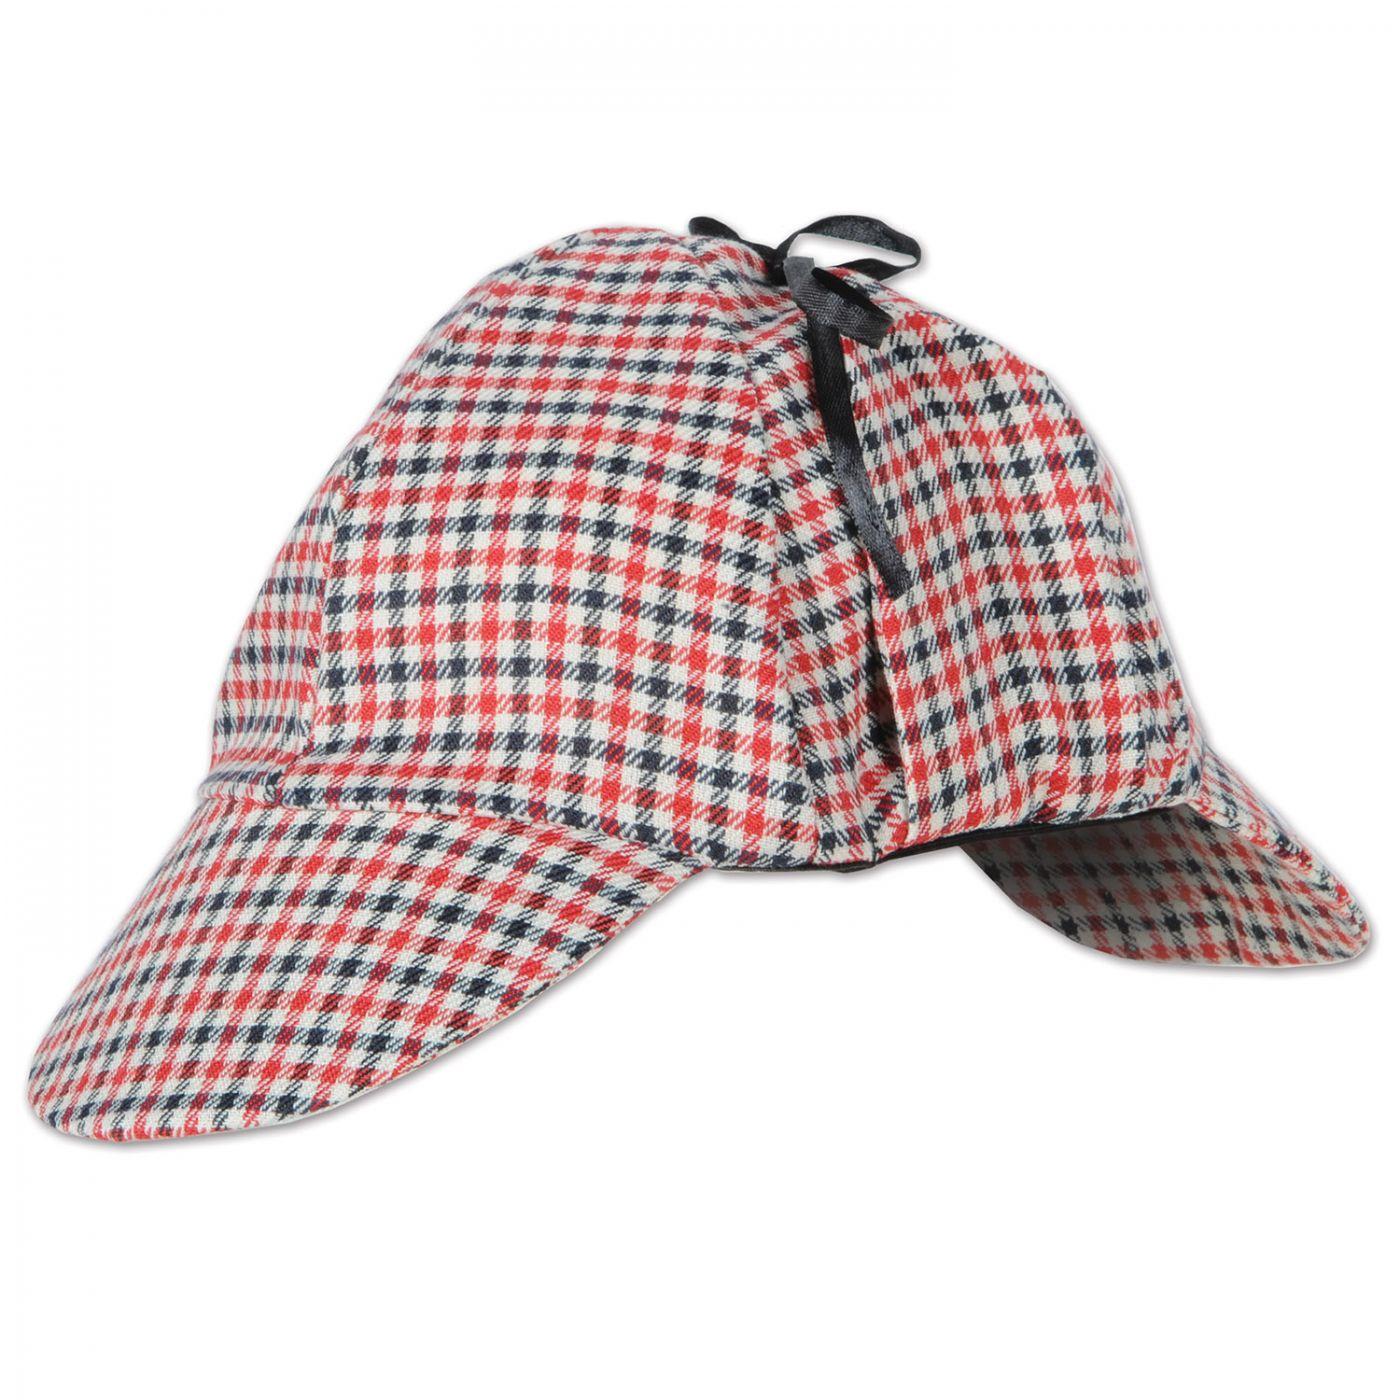 Deerstalker Hat image